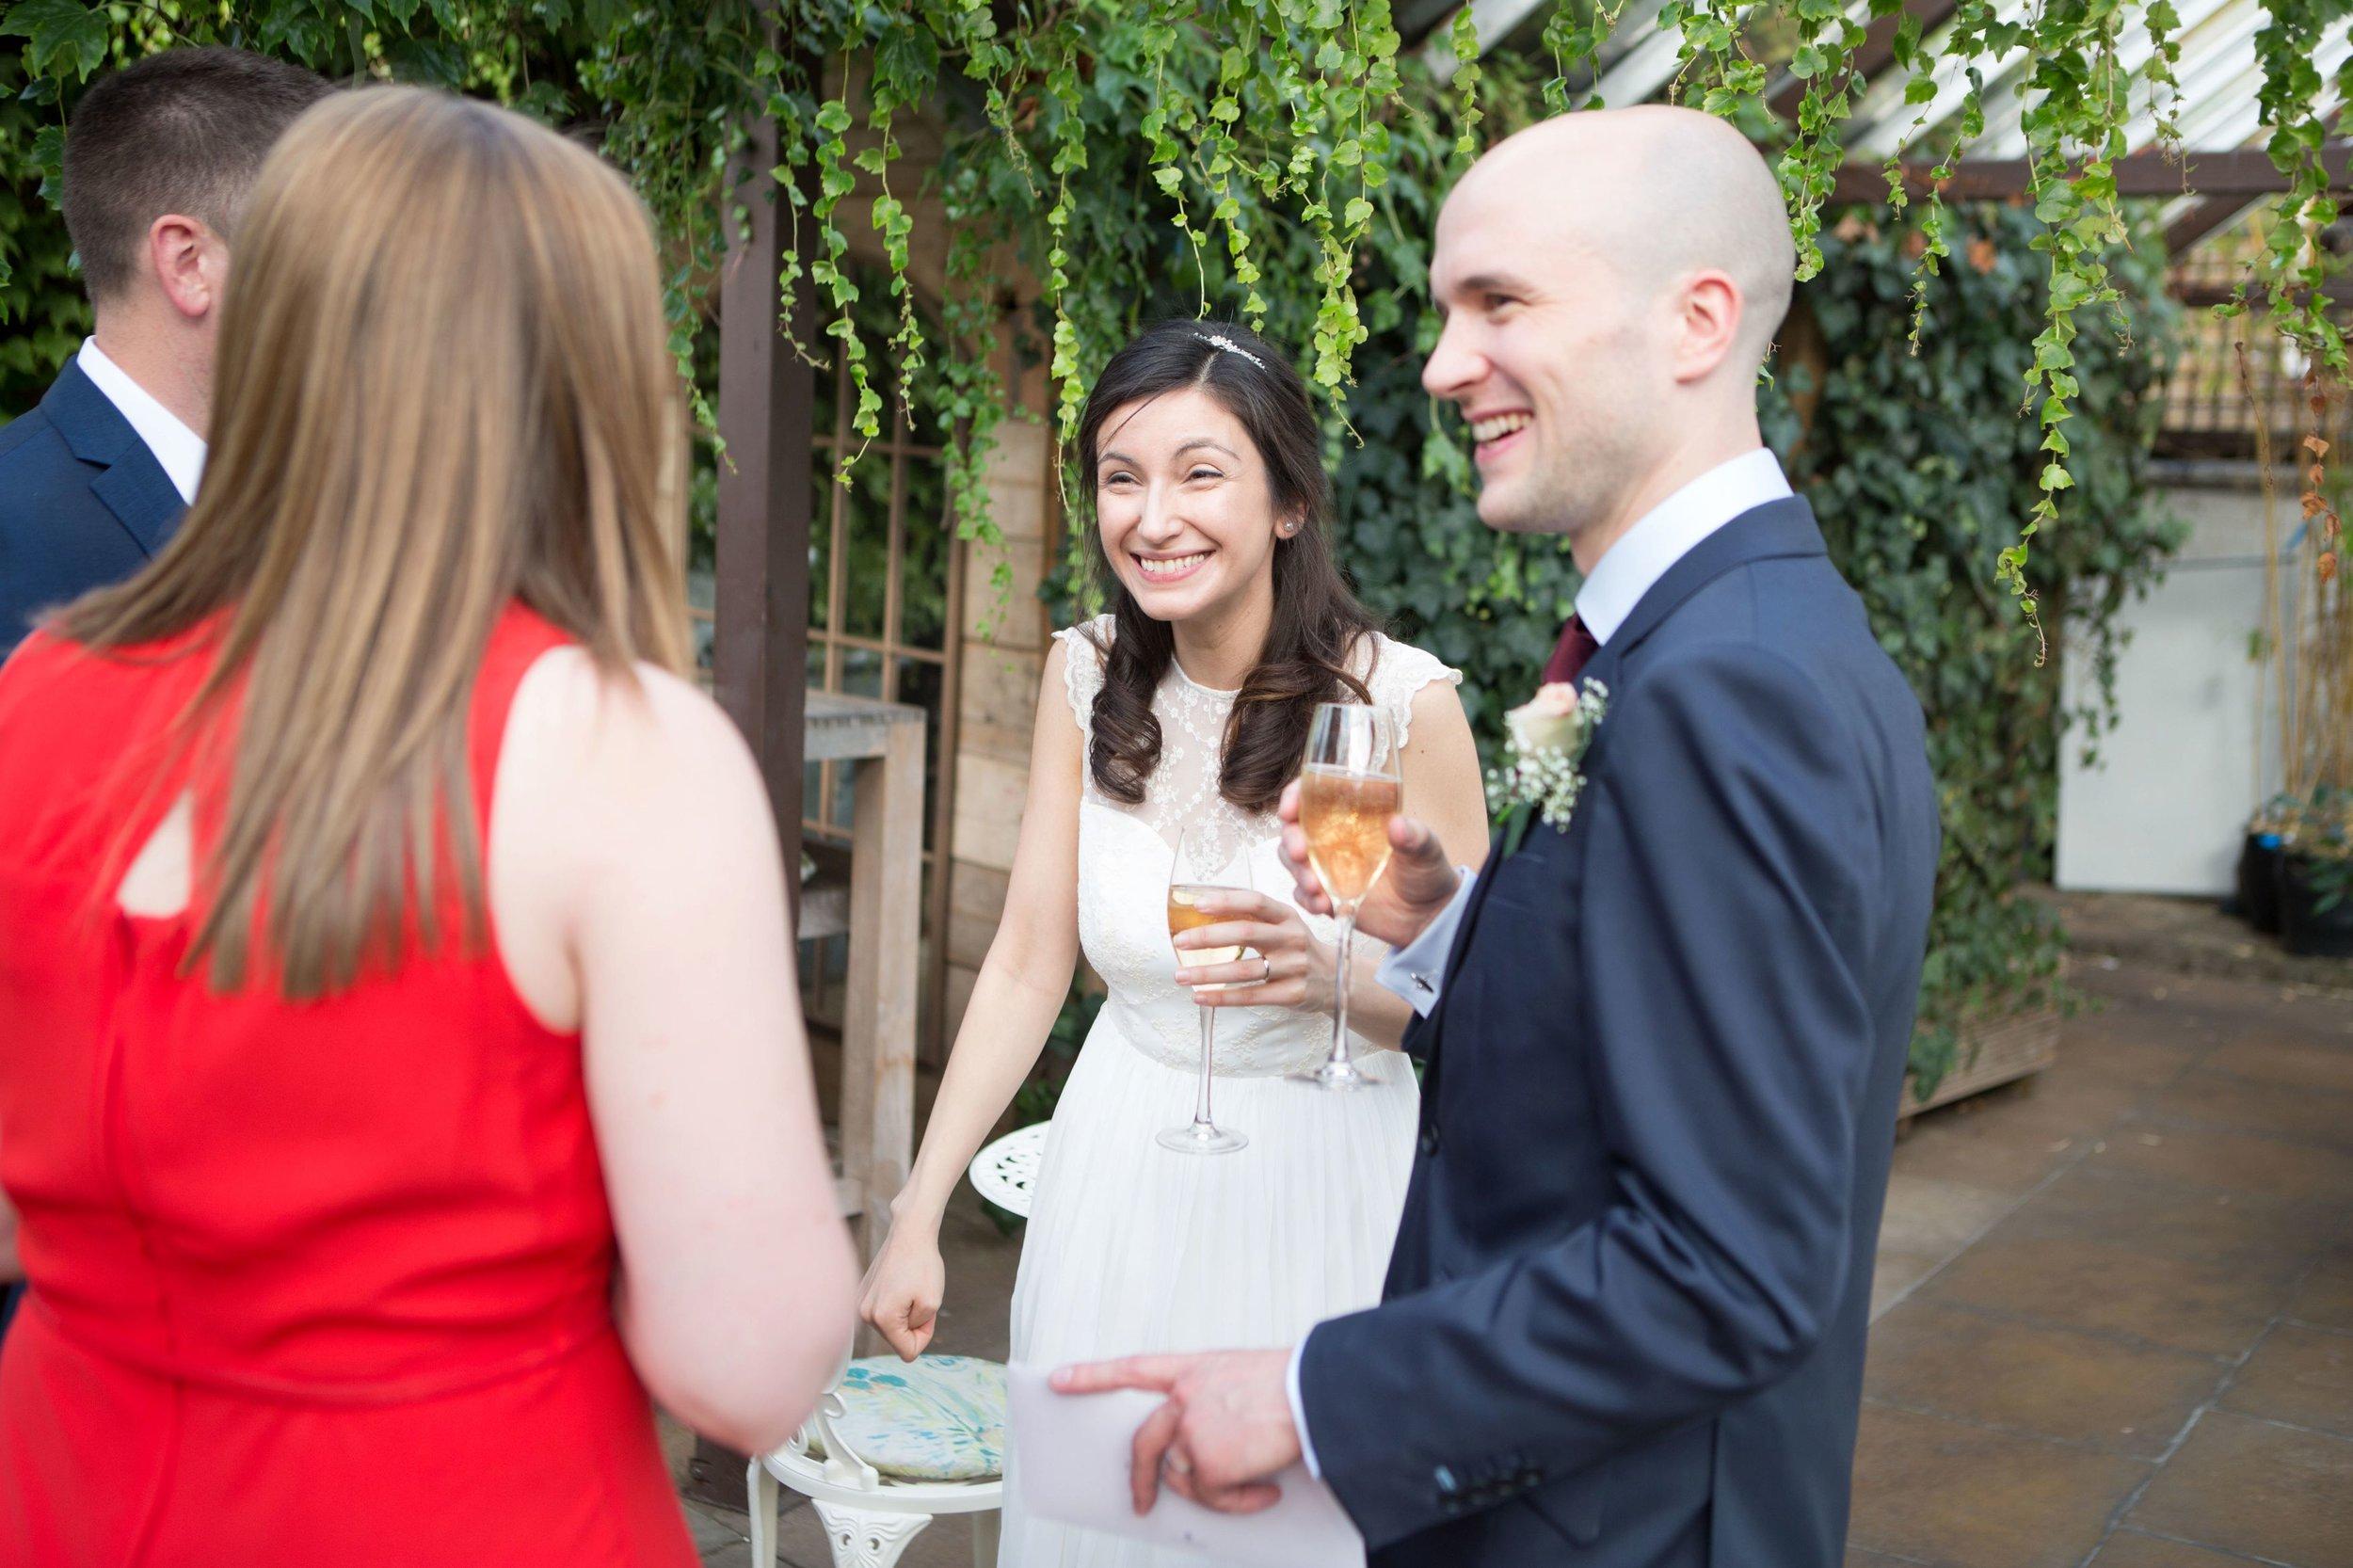 Hulya_&_Ben's_Clifton_Nurseries_London_Wedding_0410.jpg